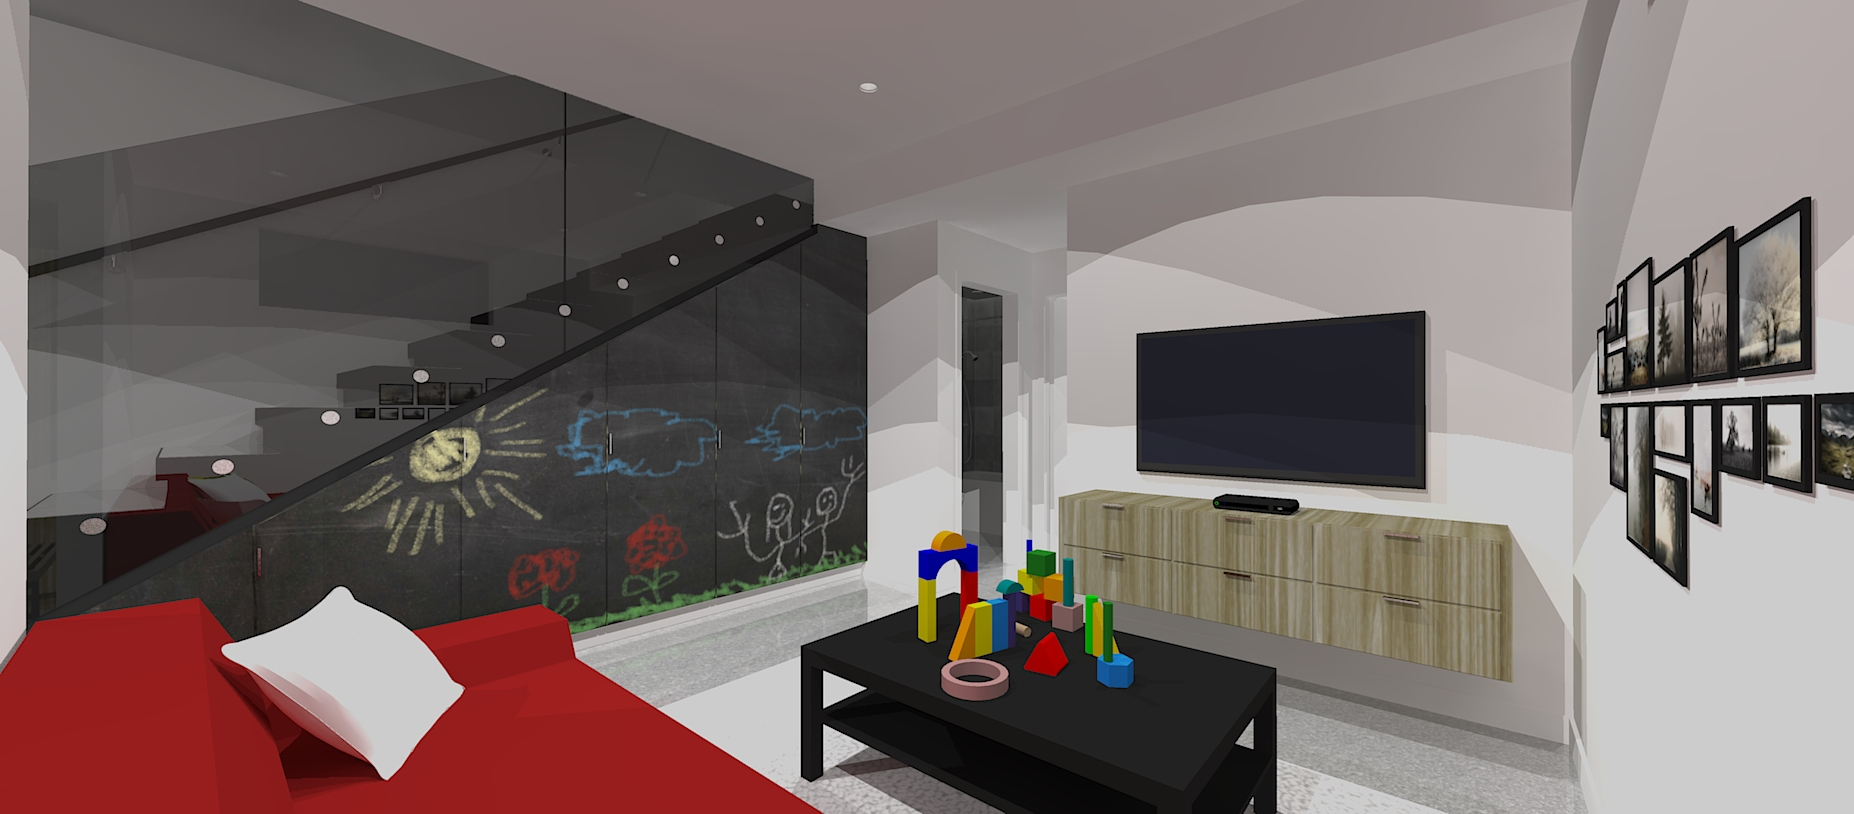 34 - TV Play Room.jpg